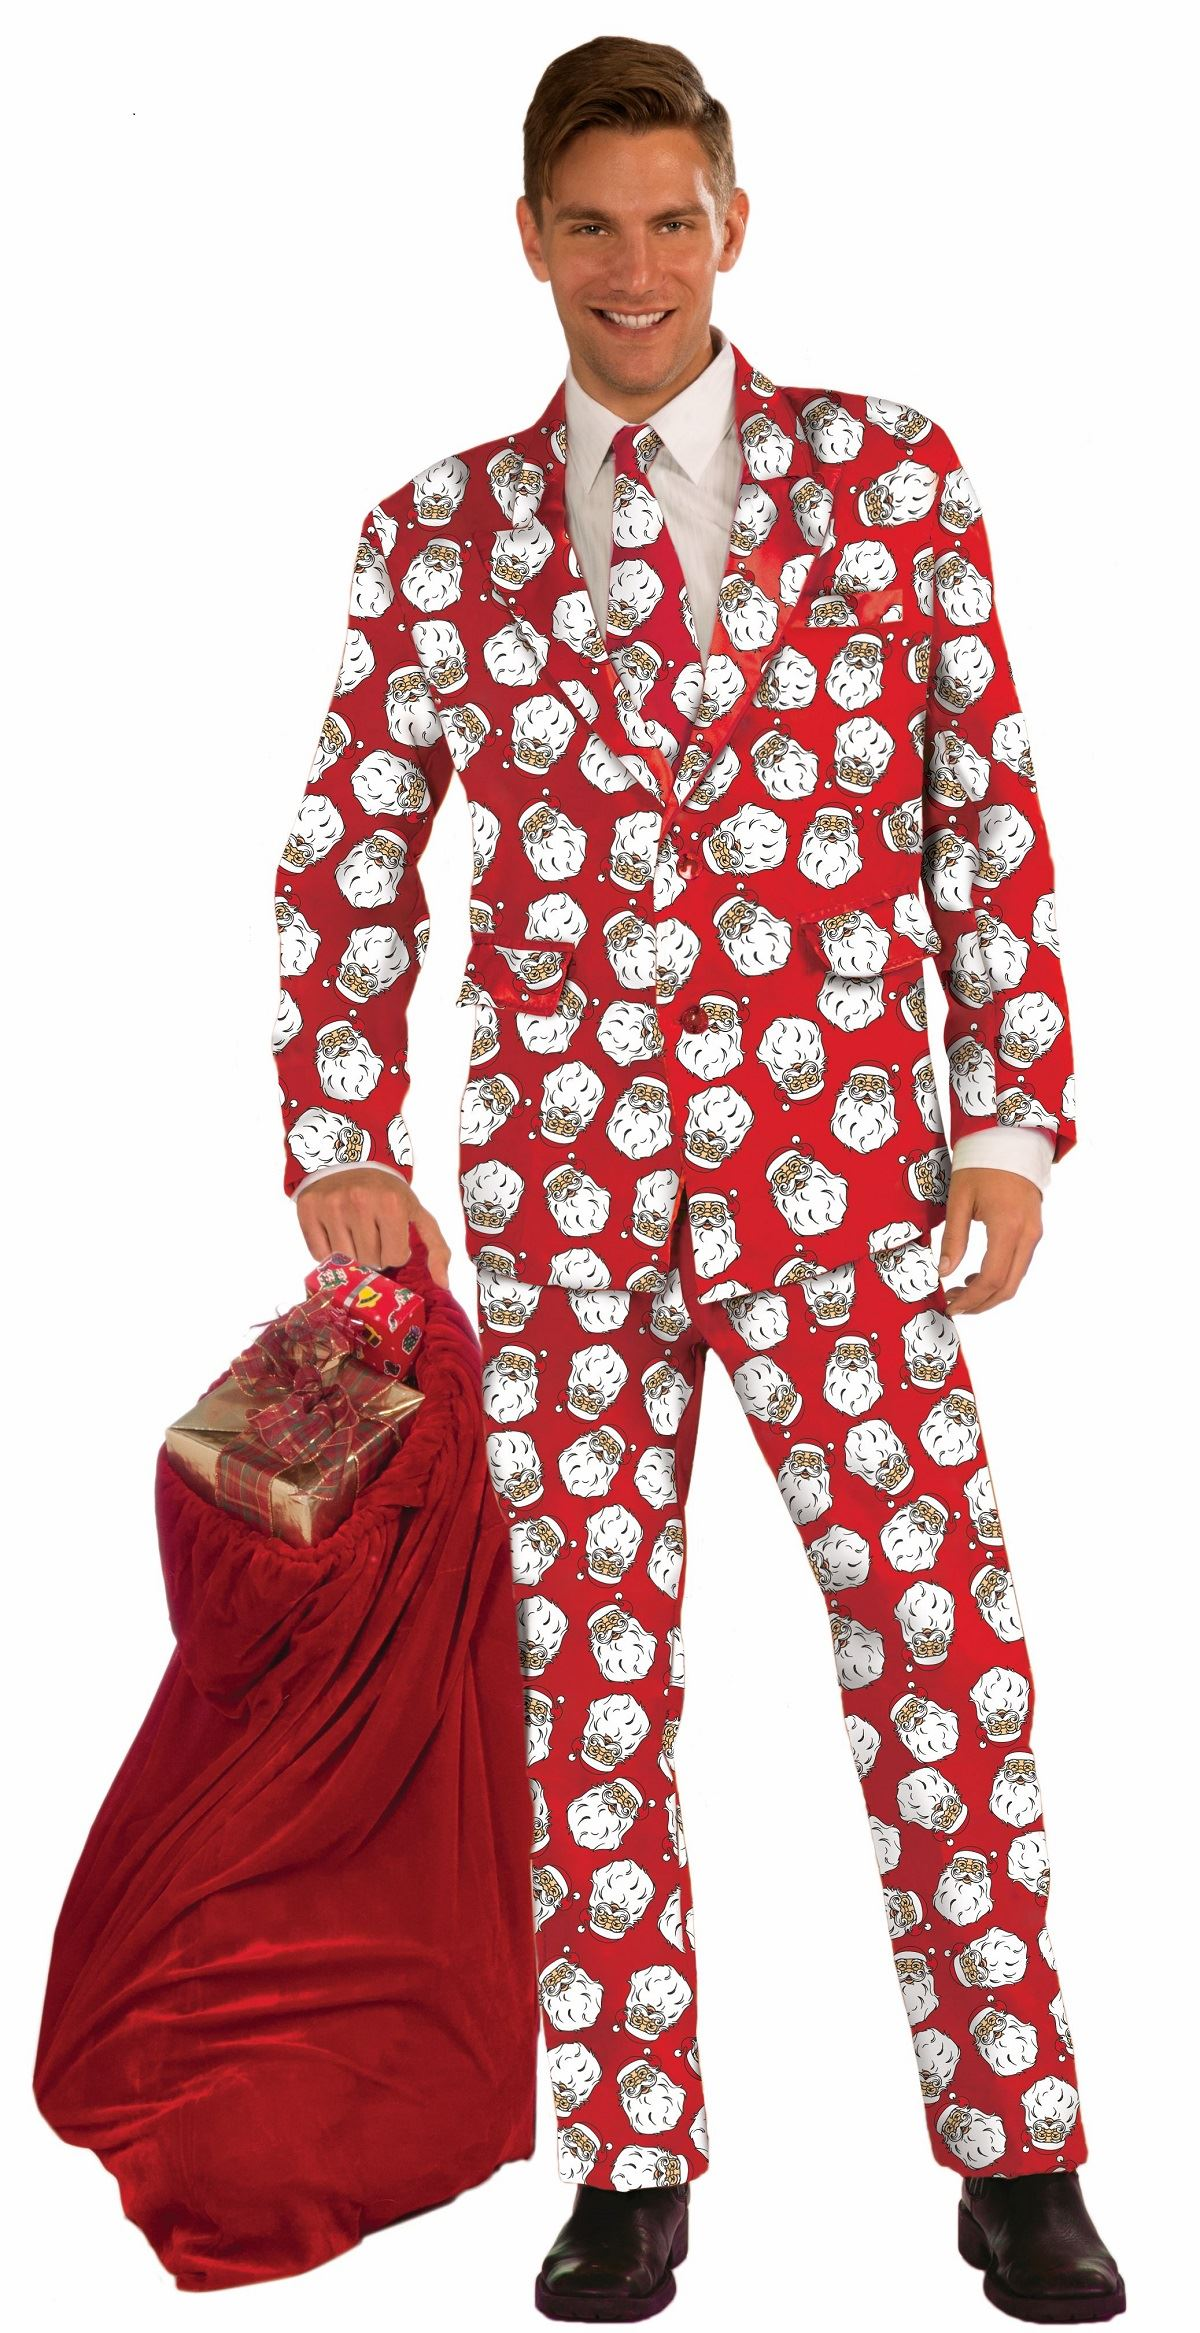 Santa tuxedo christmas halloween costume 63 99 the costume land